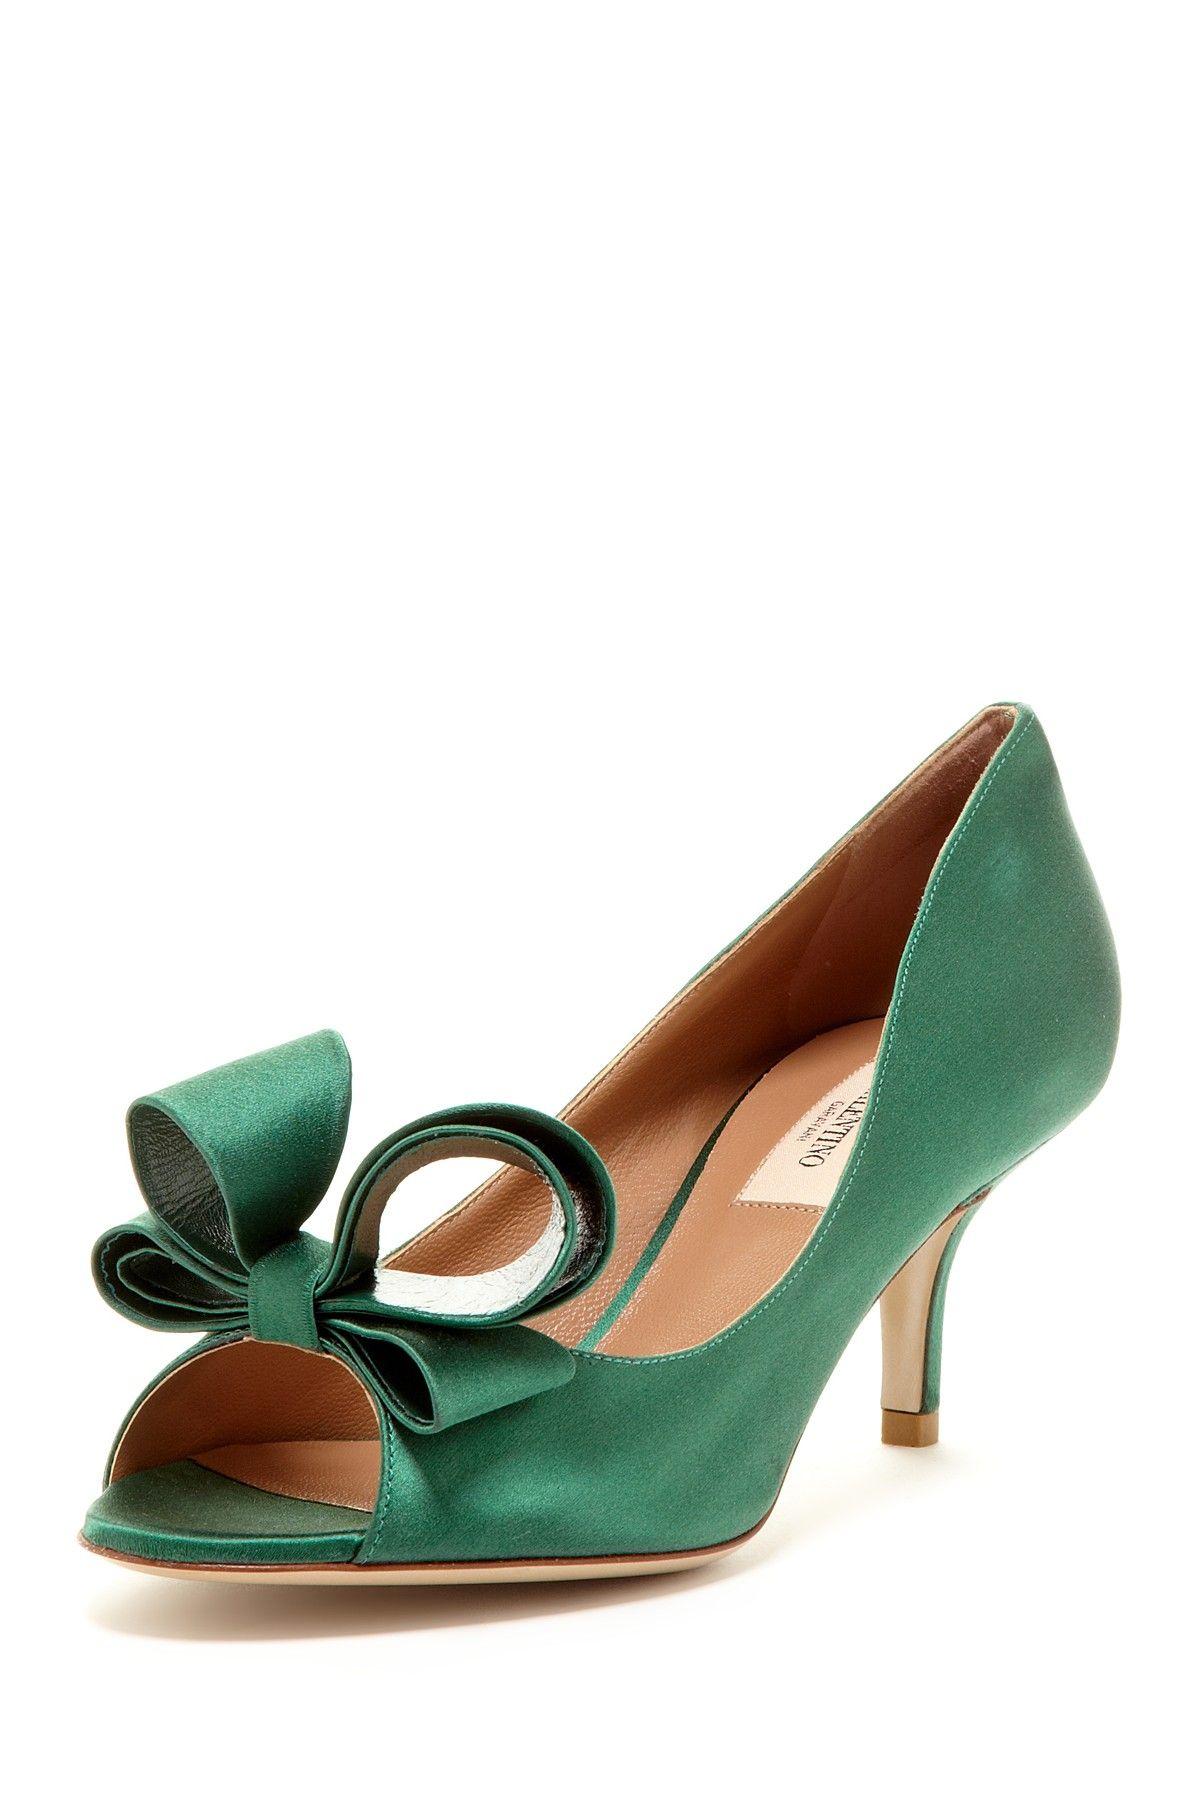 Valentino Emerald Peep Toe with Bows